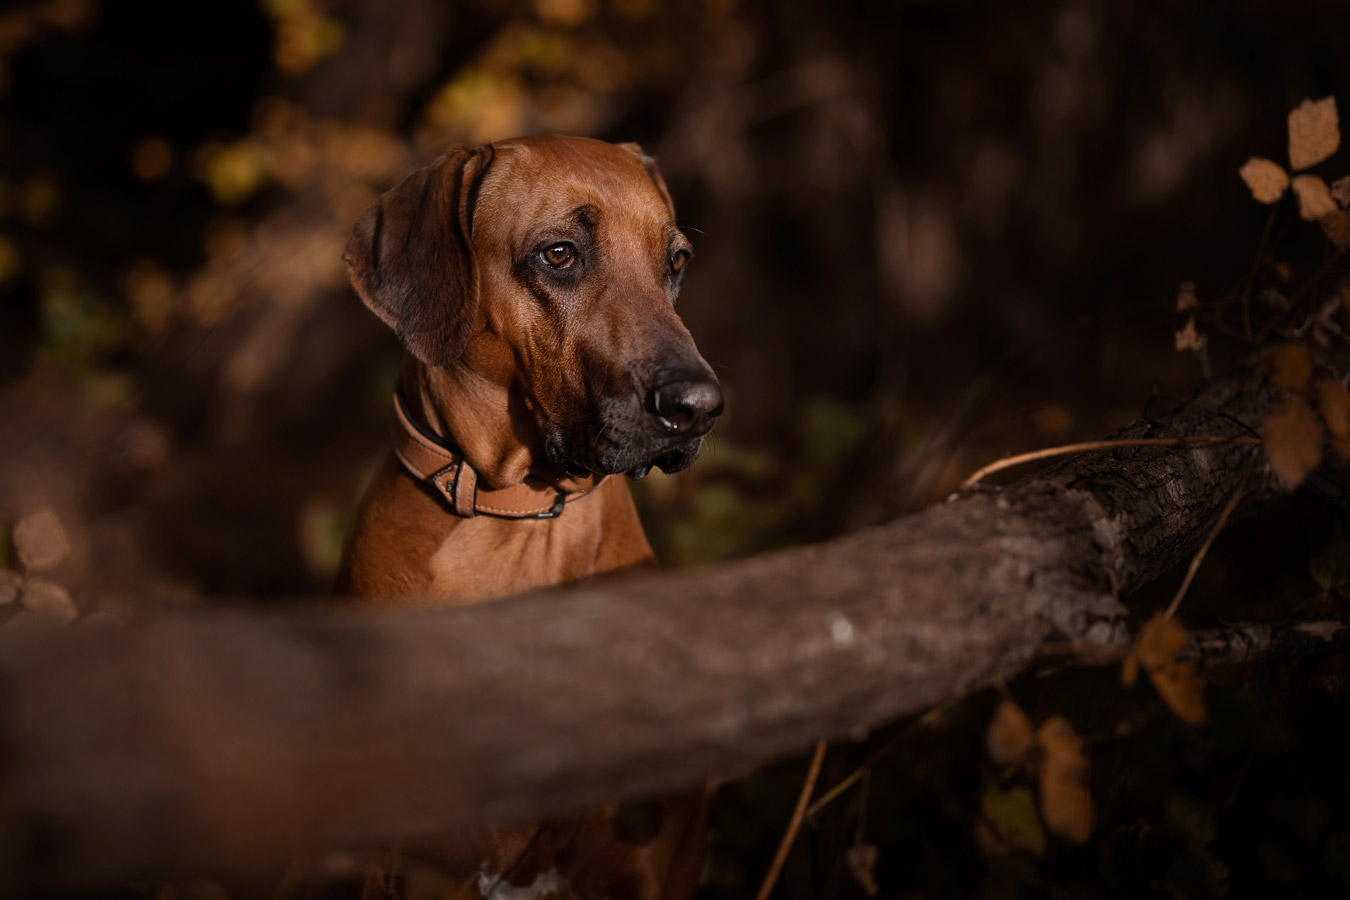 Rhodesian Ridgeback / hundefotografie / Fotostyle Schindler / Fotograf / Straubing